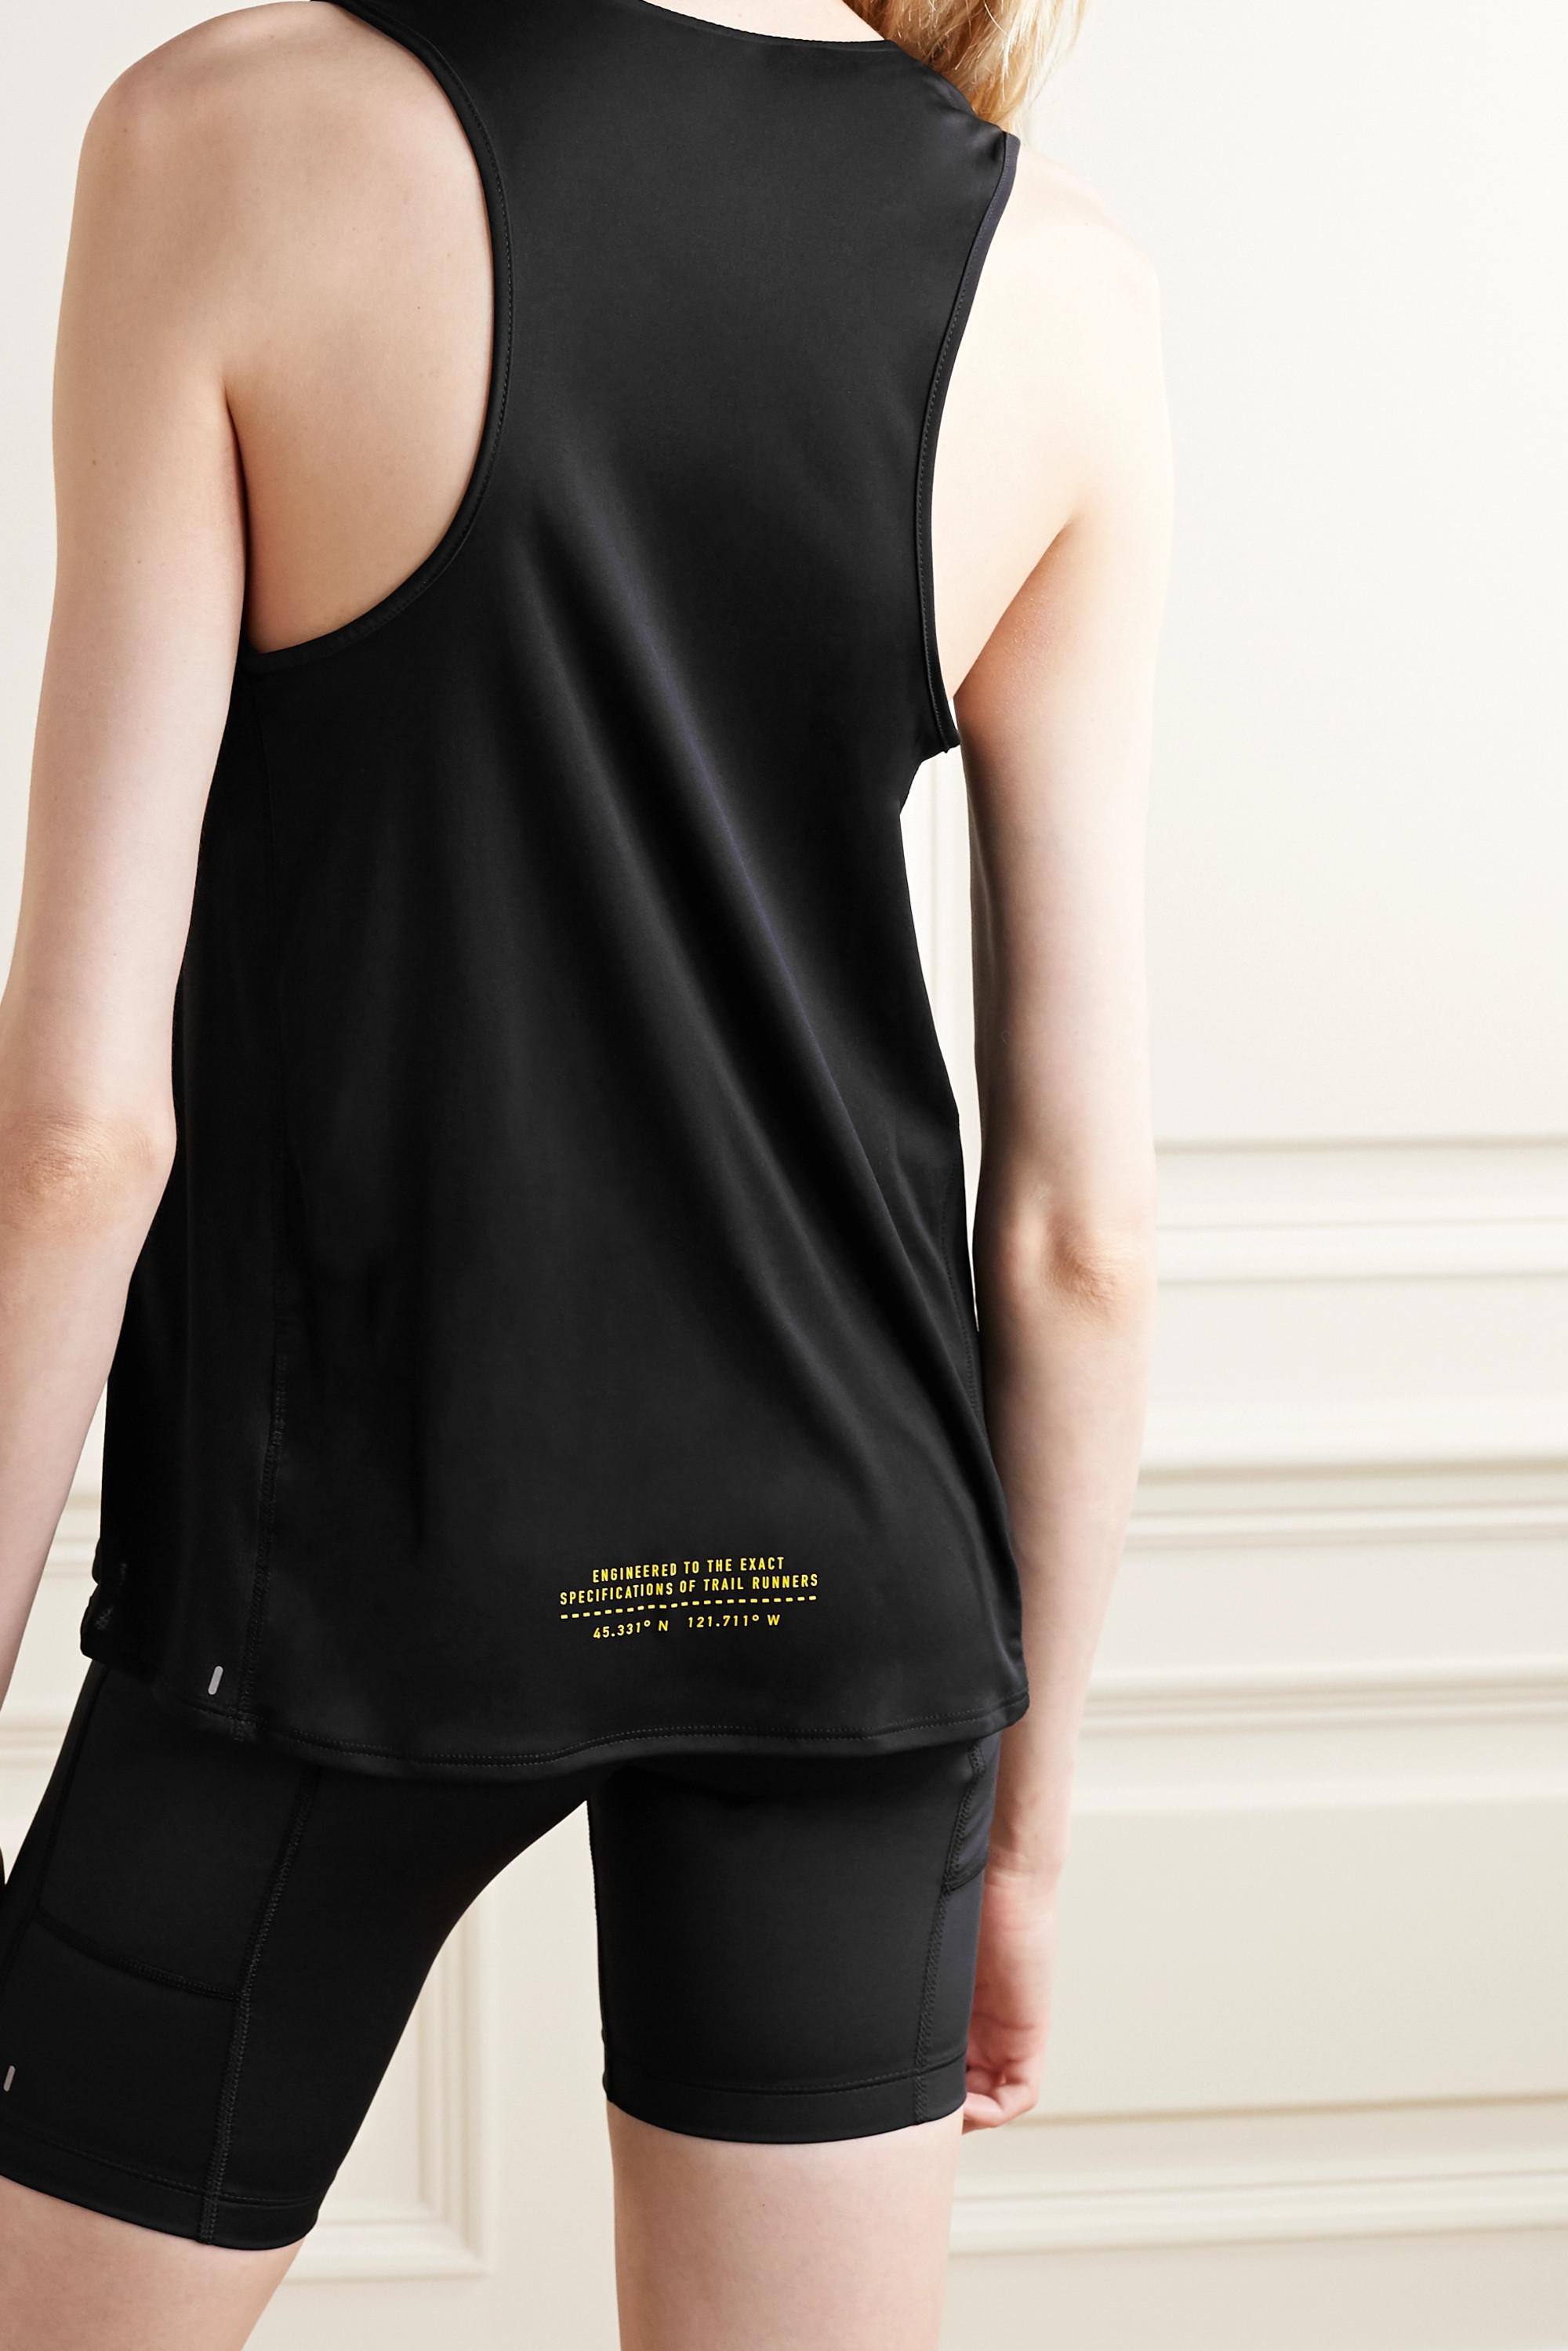 Nike City Sleek Tanktop aus Dri-FIT-Material mit Print